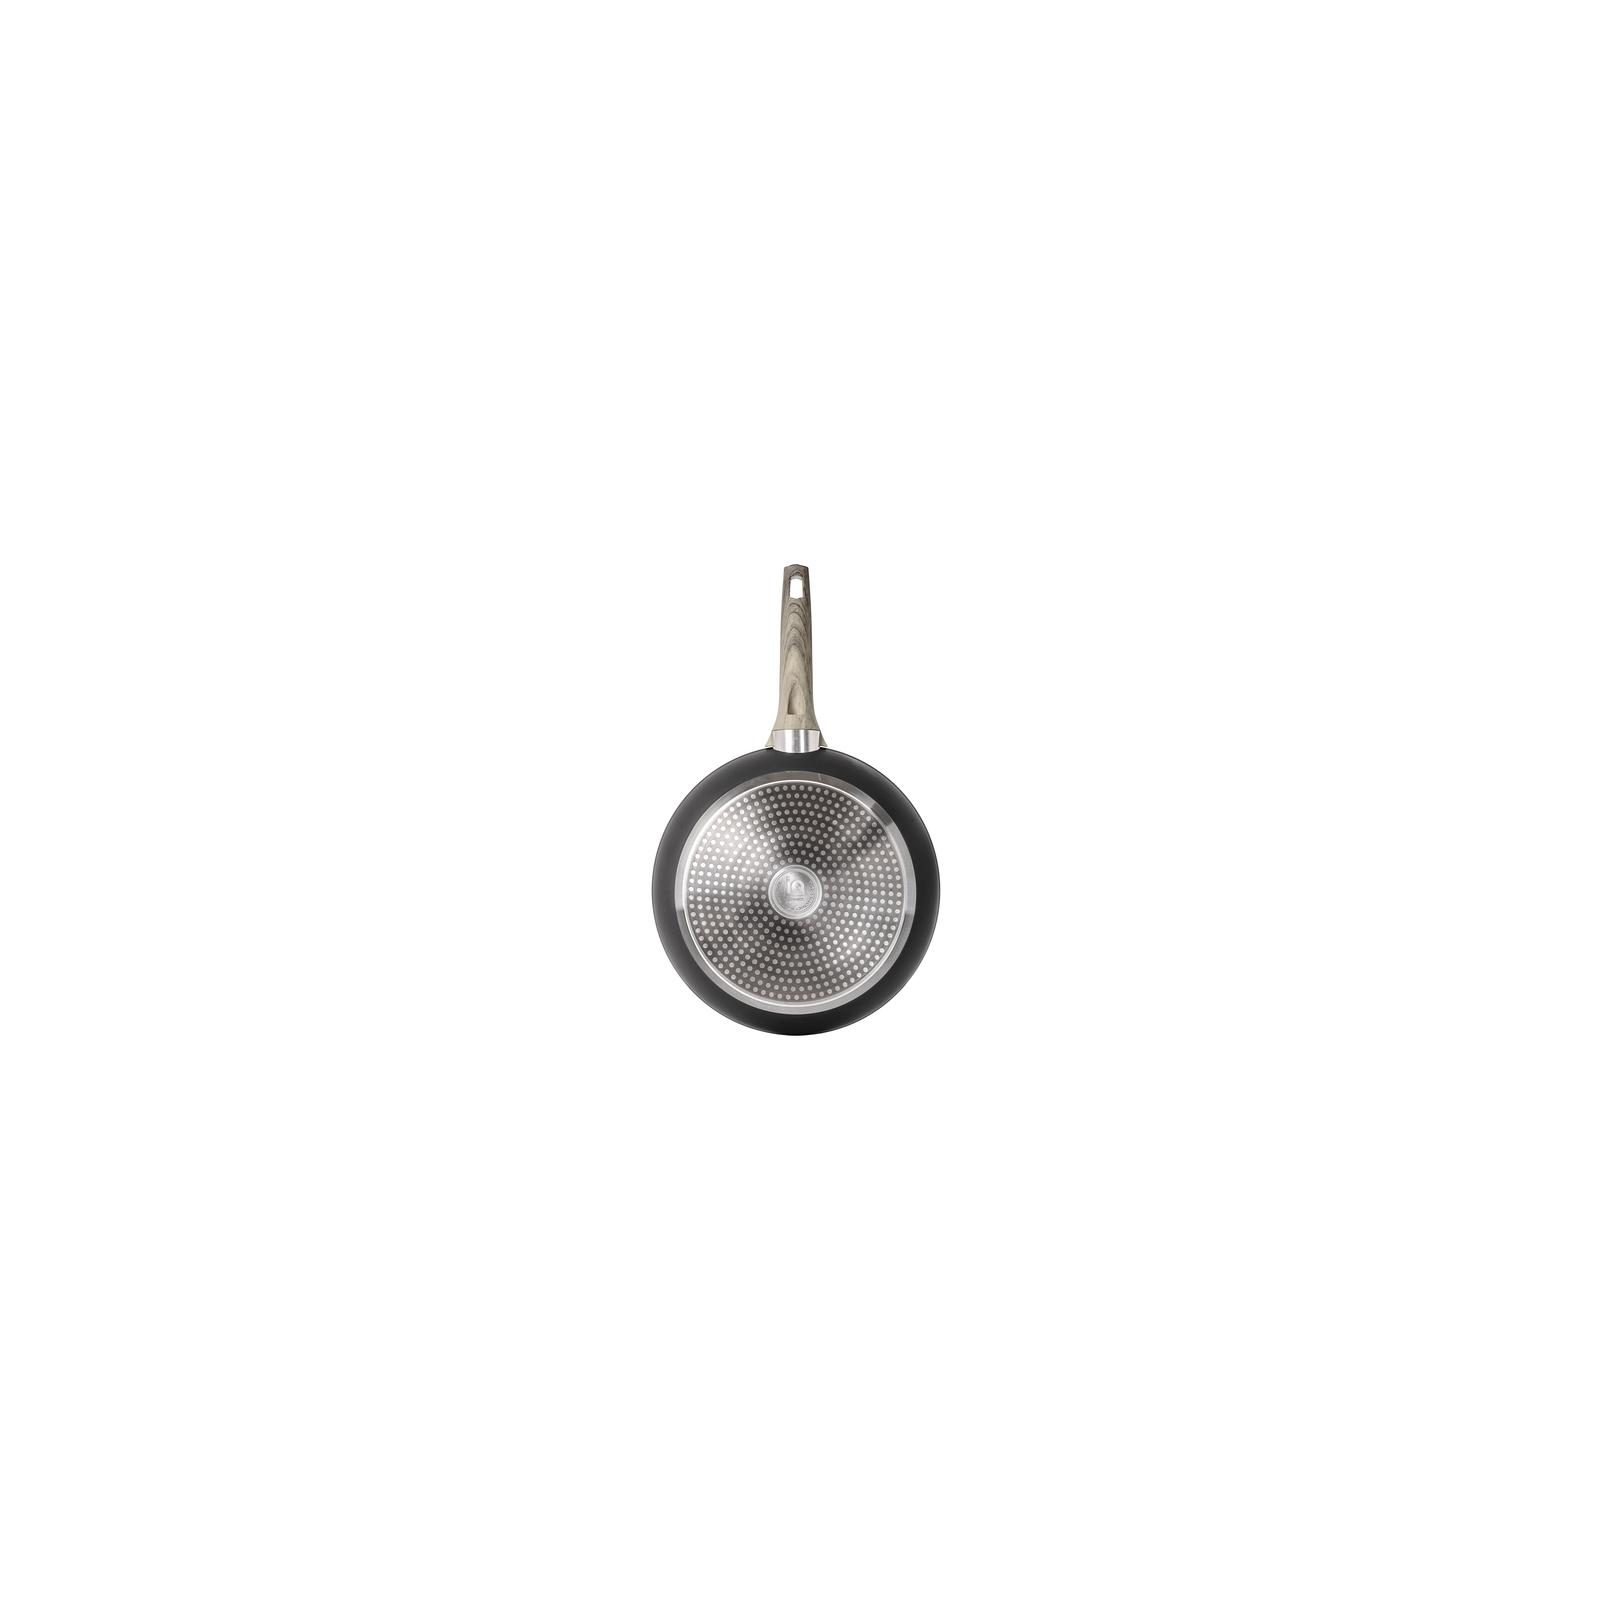 Сковорода Ringel IQ Nordic 24 см (RG-1123-24) изображение 4